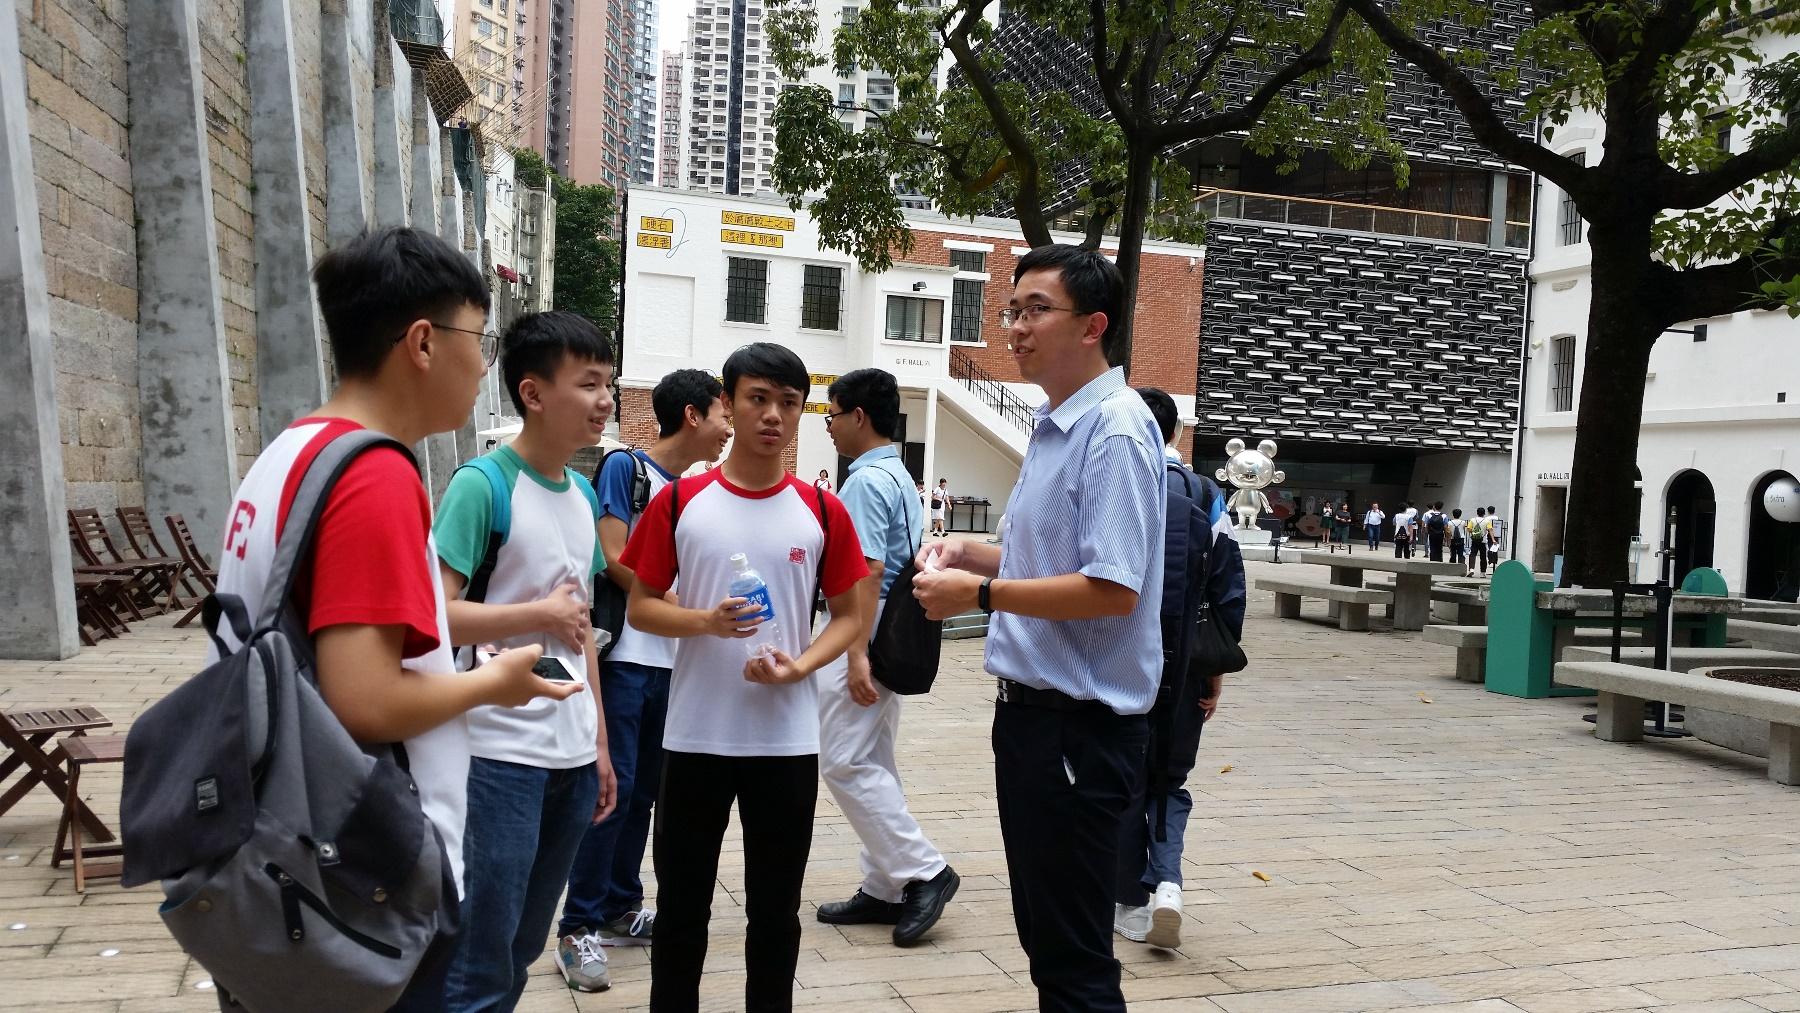 https://npc.edu.hk/sites/default/files/20190711_104237.jpg